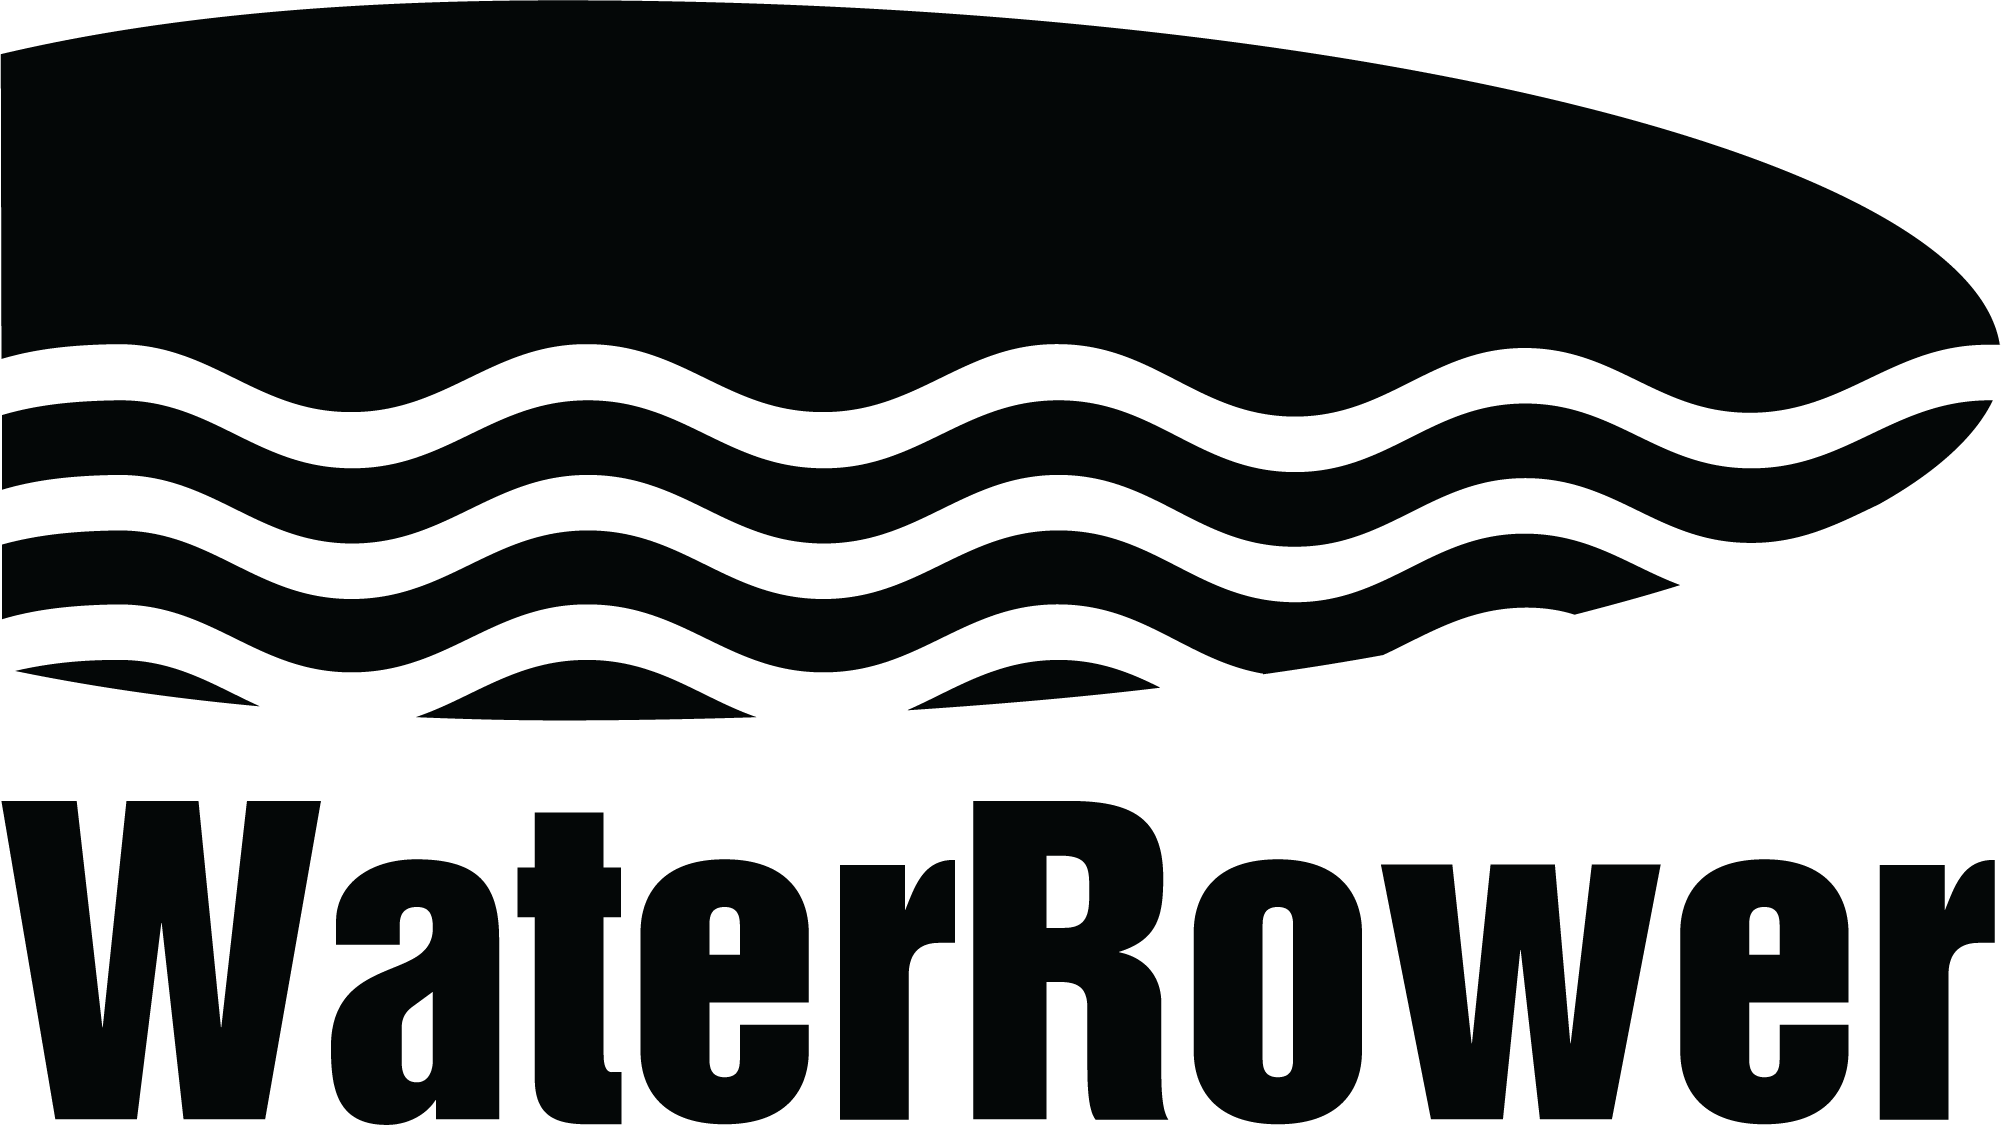 waterrower romania